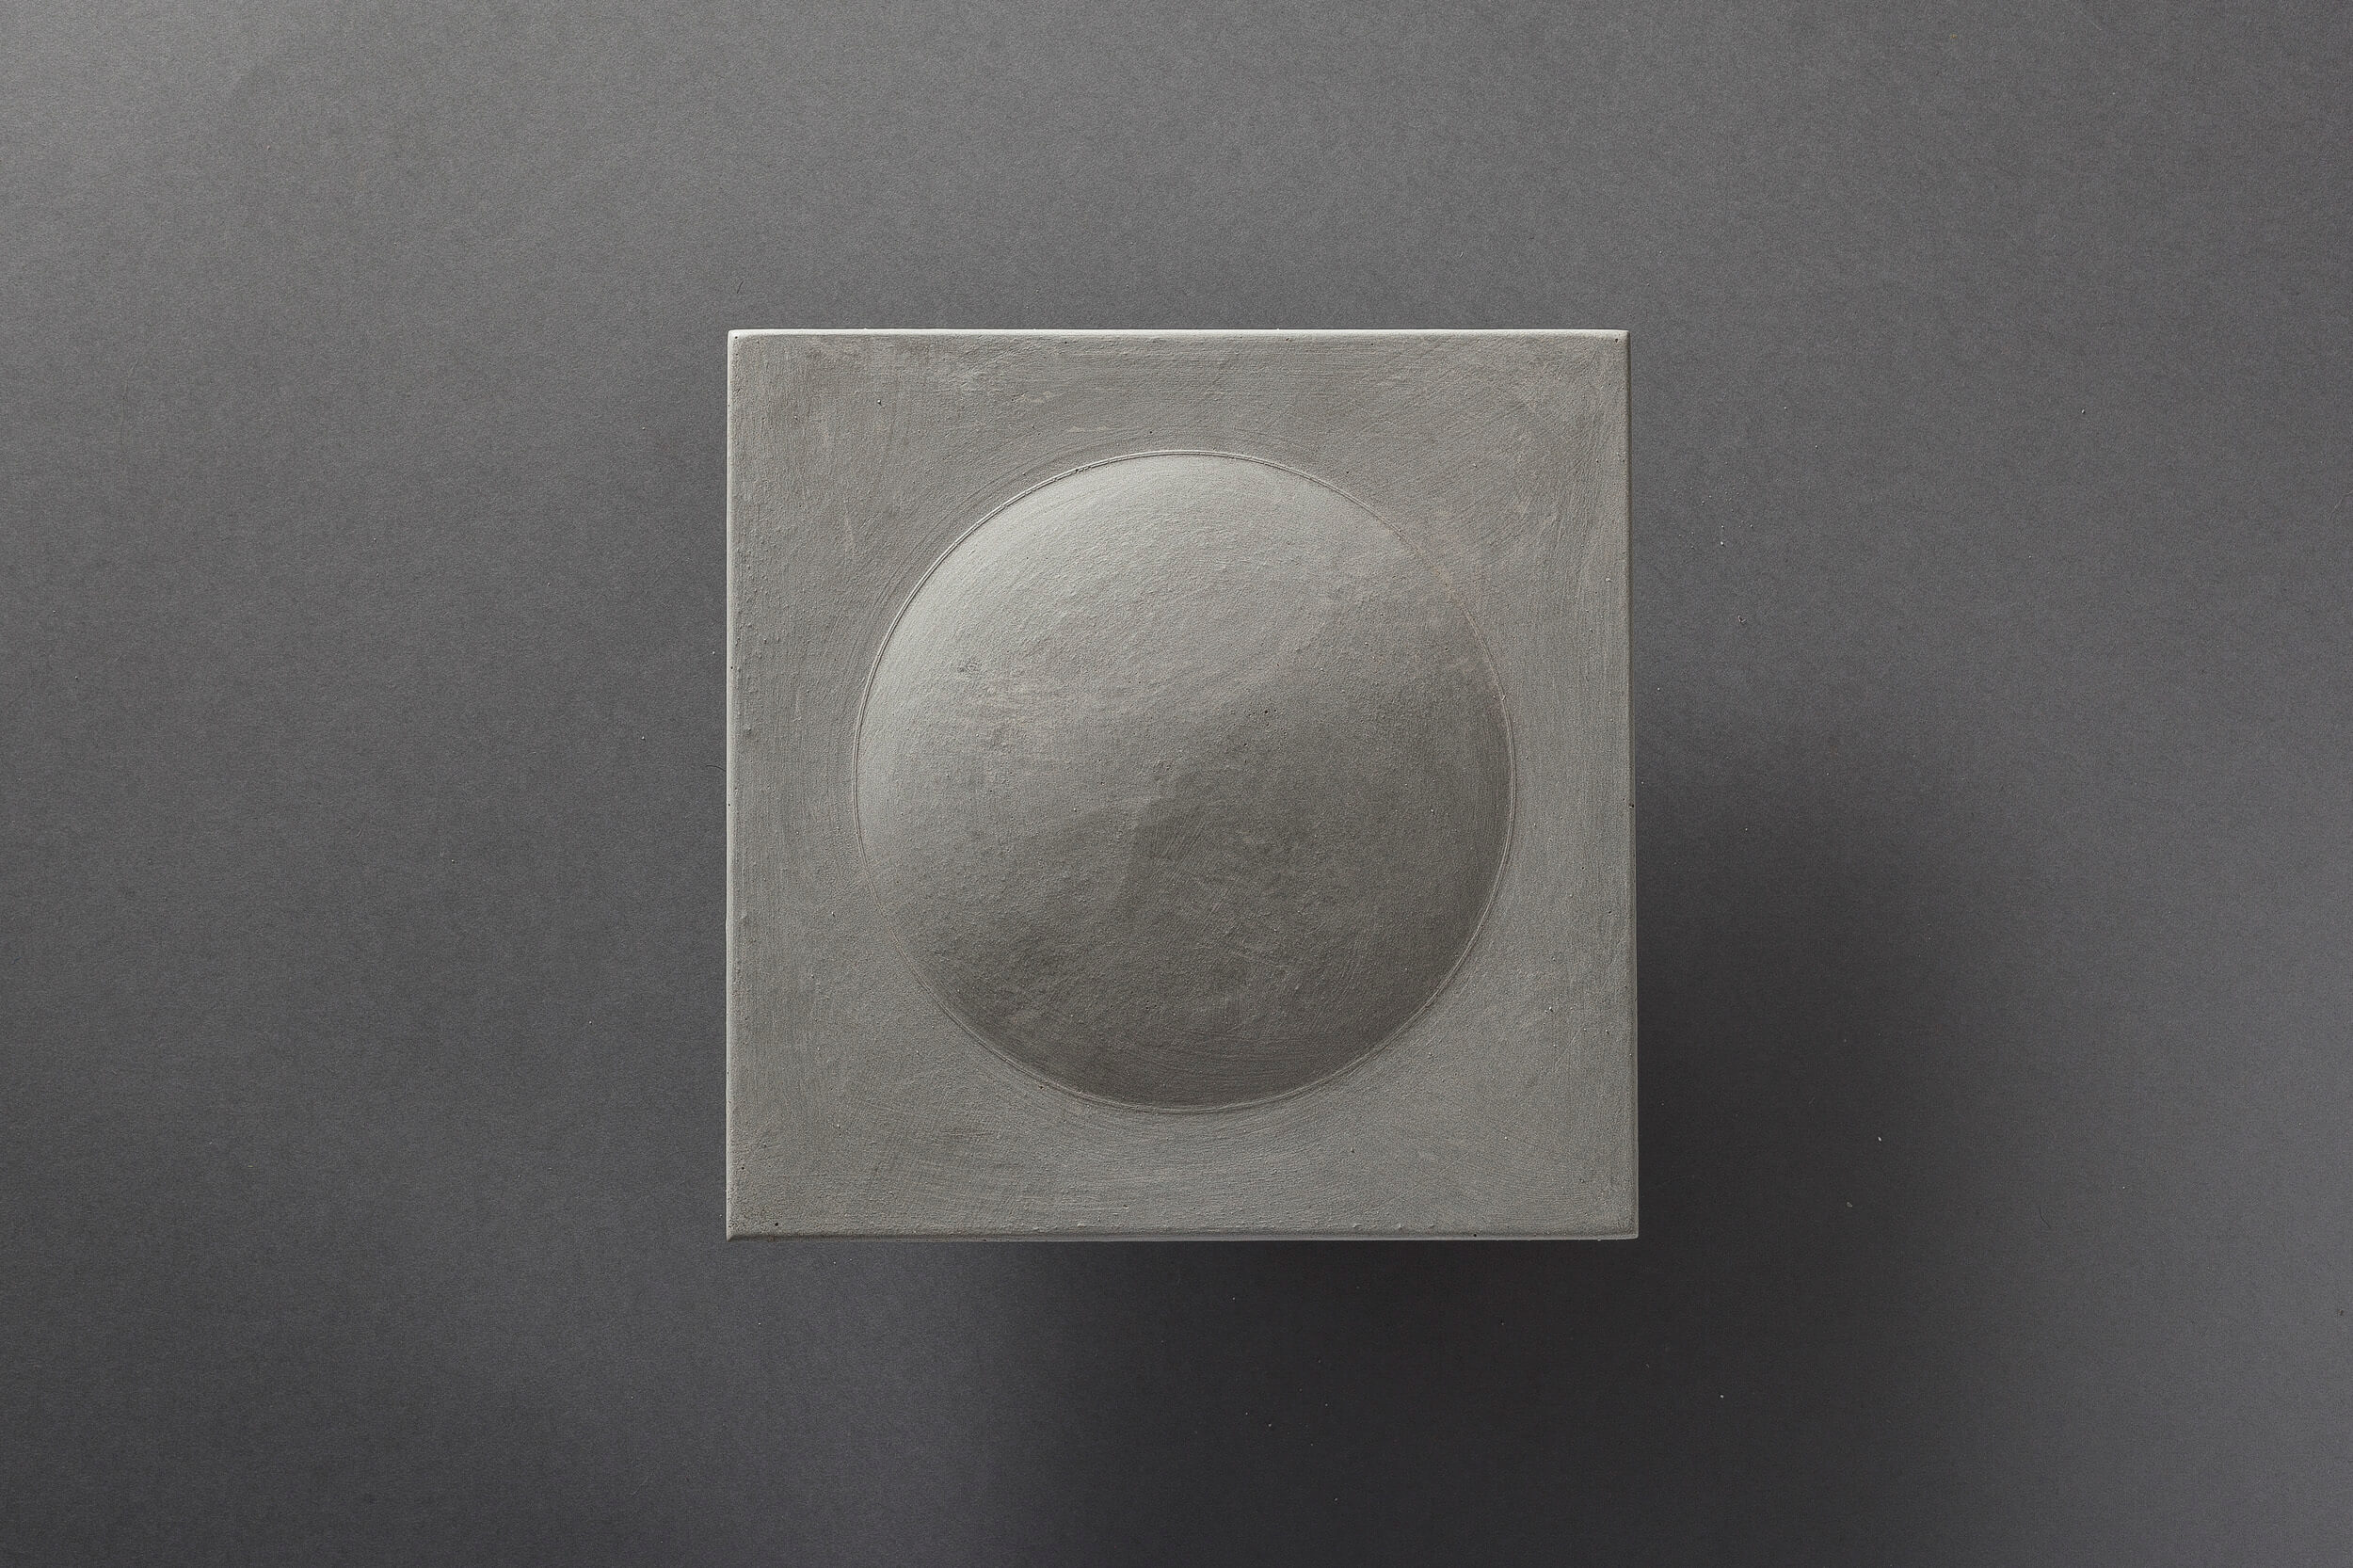 Plaster_studio_tile_06_concrete